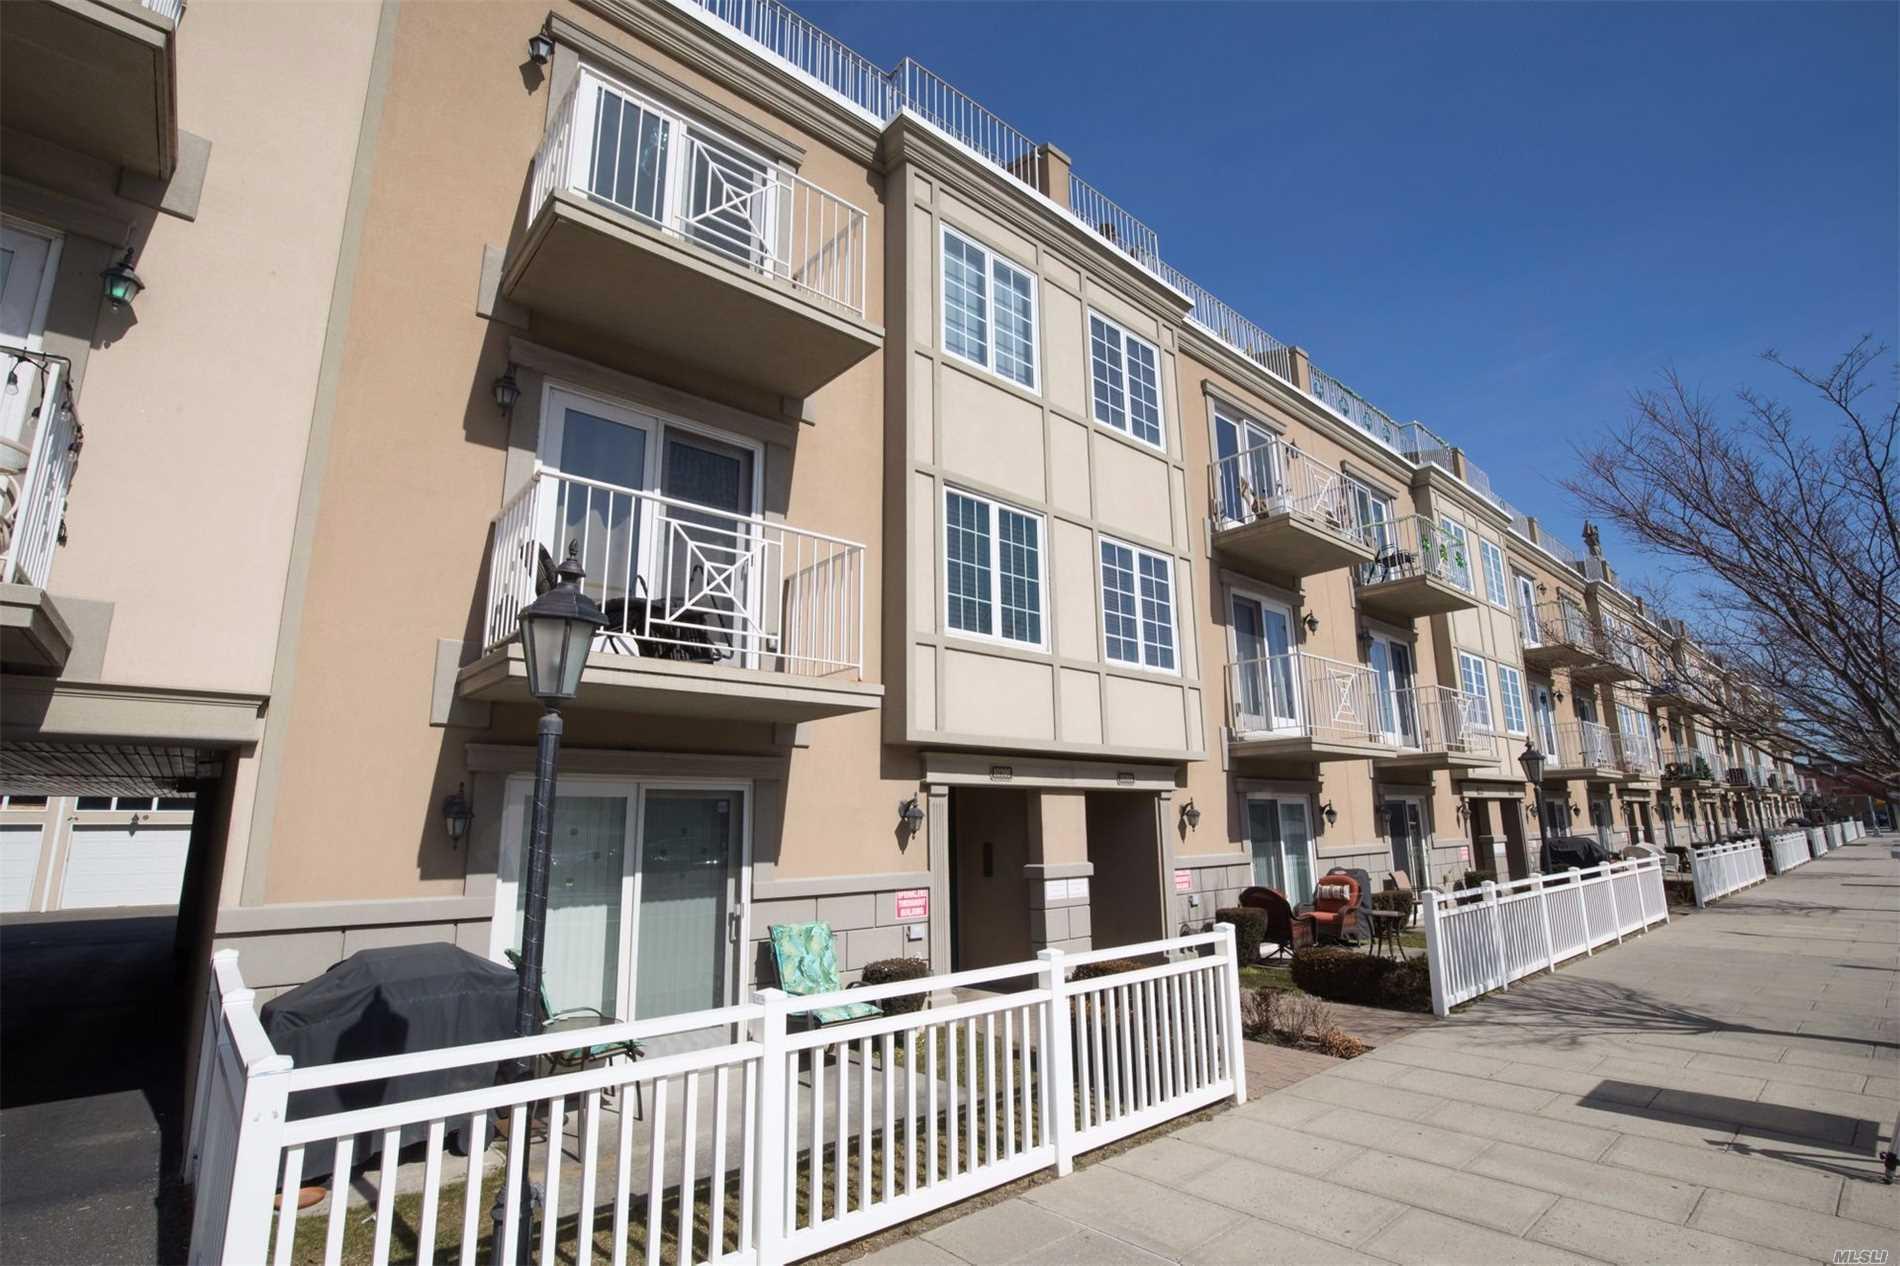 Property for sale at 103-06 Rockaway Beach B # 3C, Rockaway Park NY 11694, Rockaway Park,  New York 11694